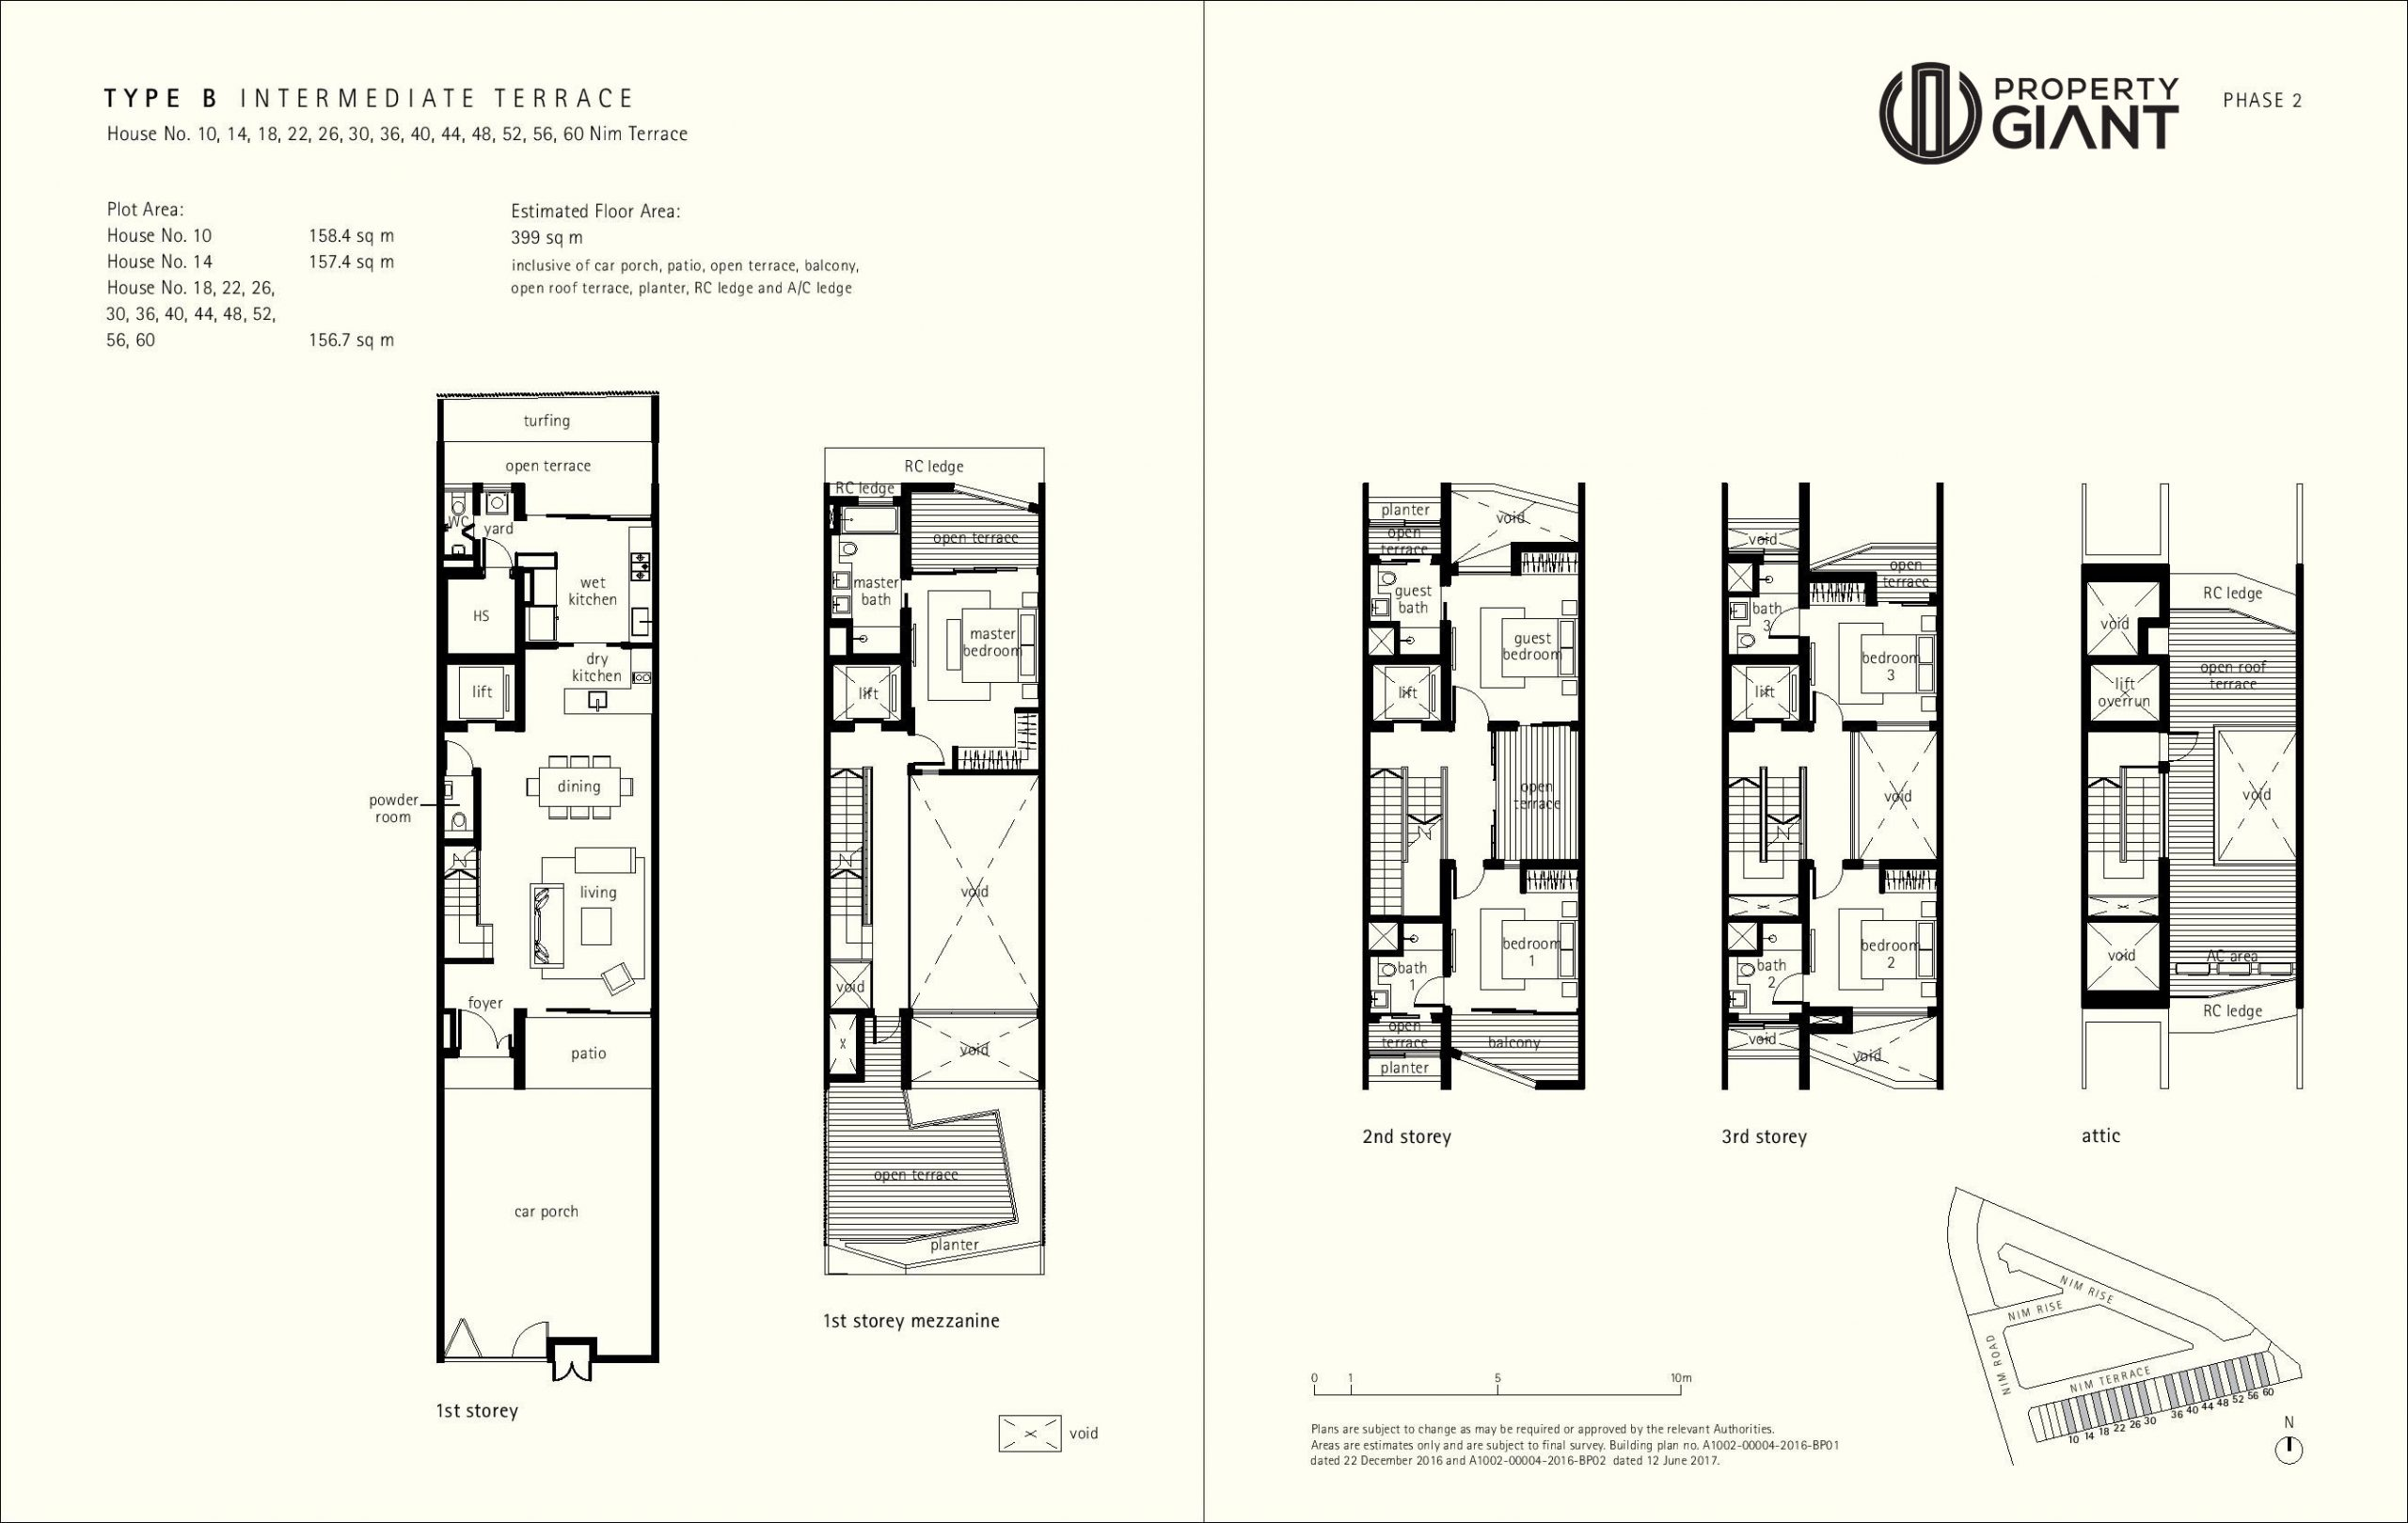 Type B - No. 10, 14, 18, 22, 26, 30, 36, 40, 44, 48, 52, 56, 60 Nim Terrace